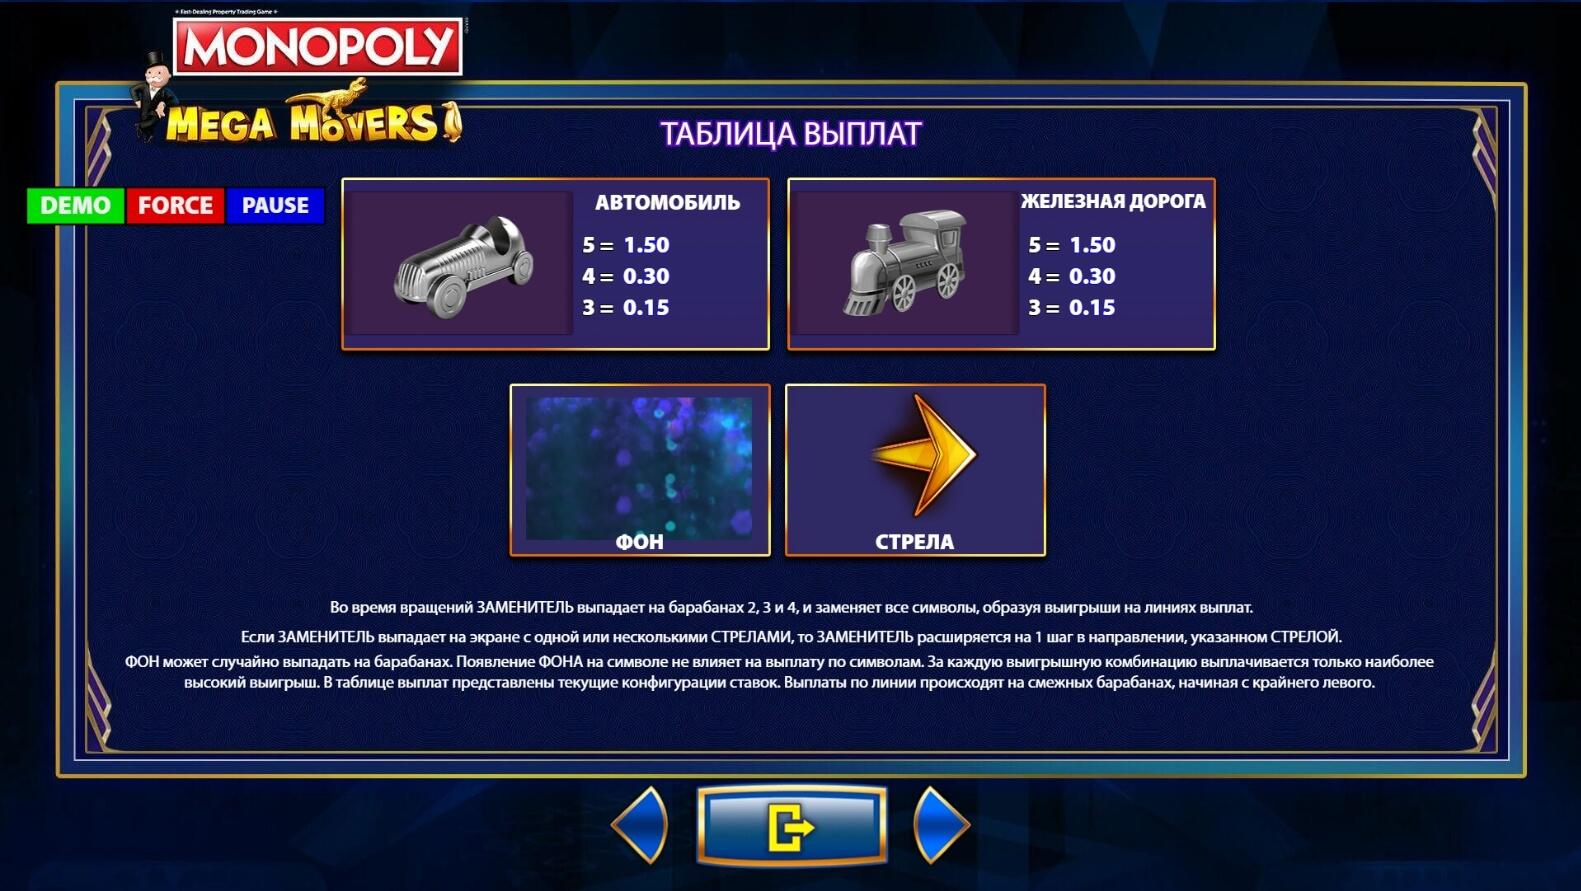 Monopoly Mega Movers Slot Machine